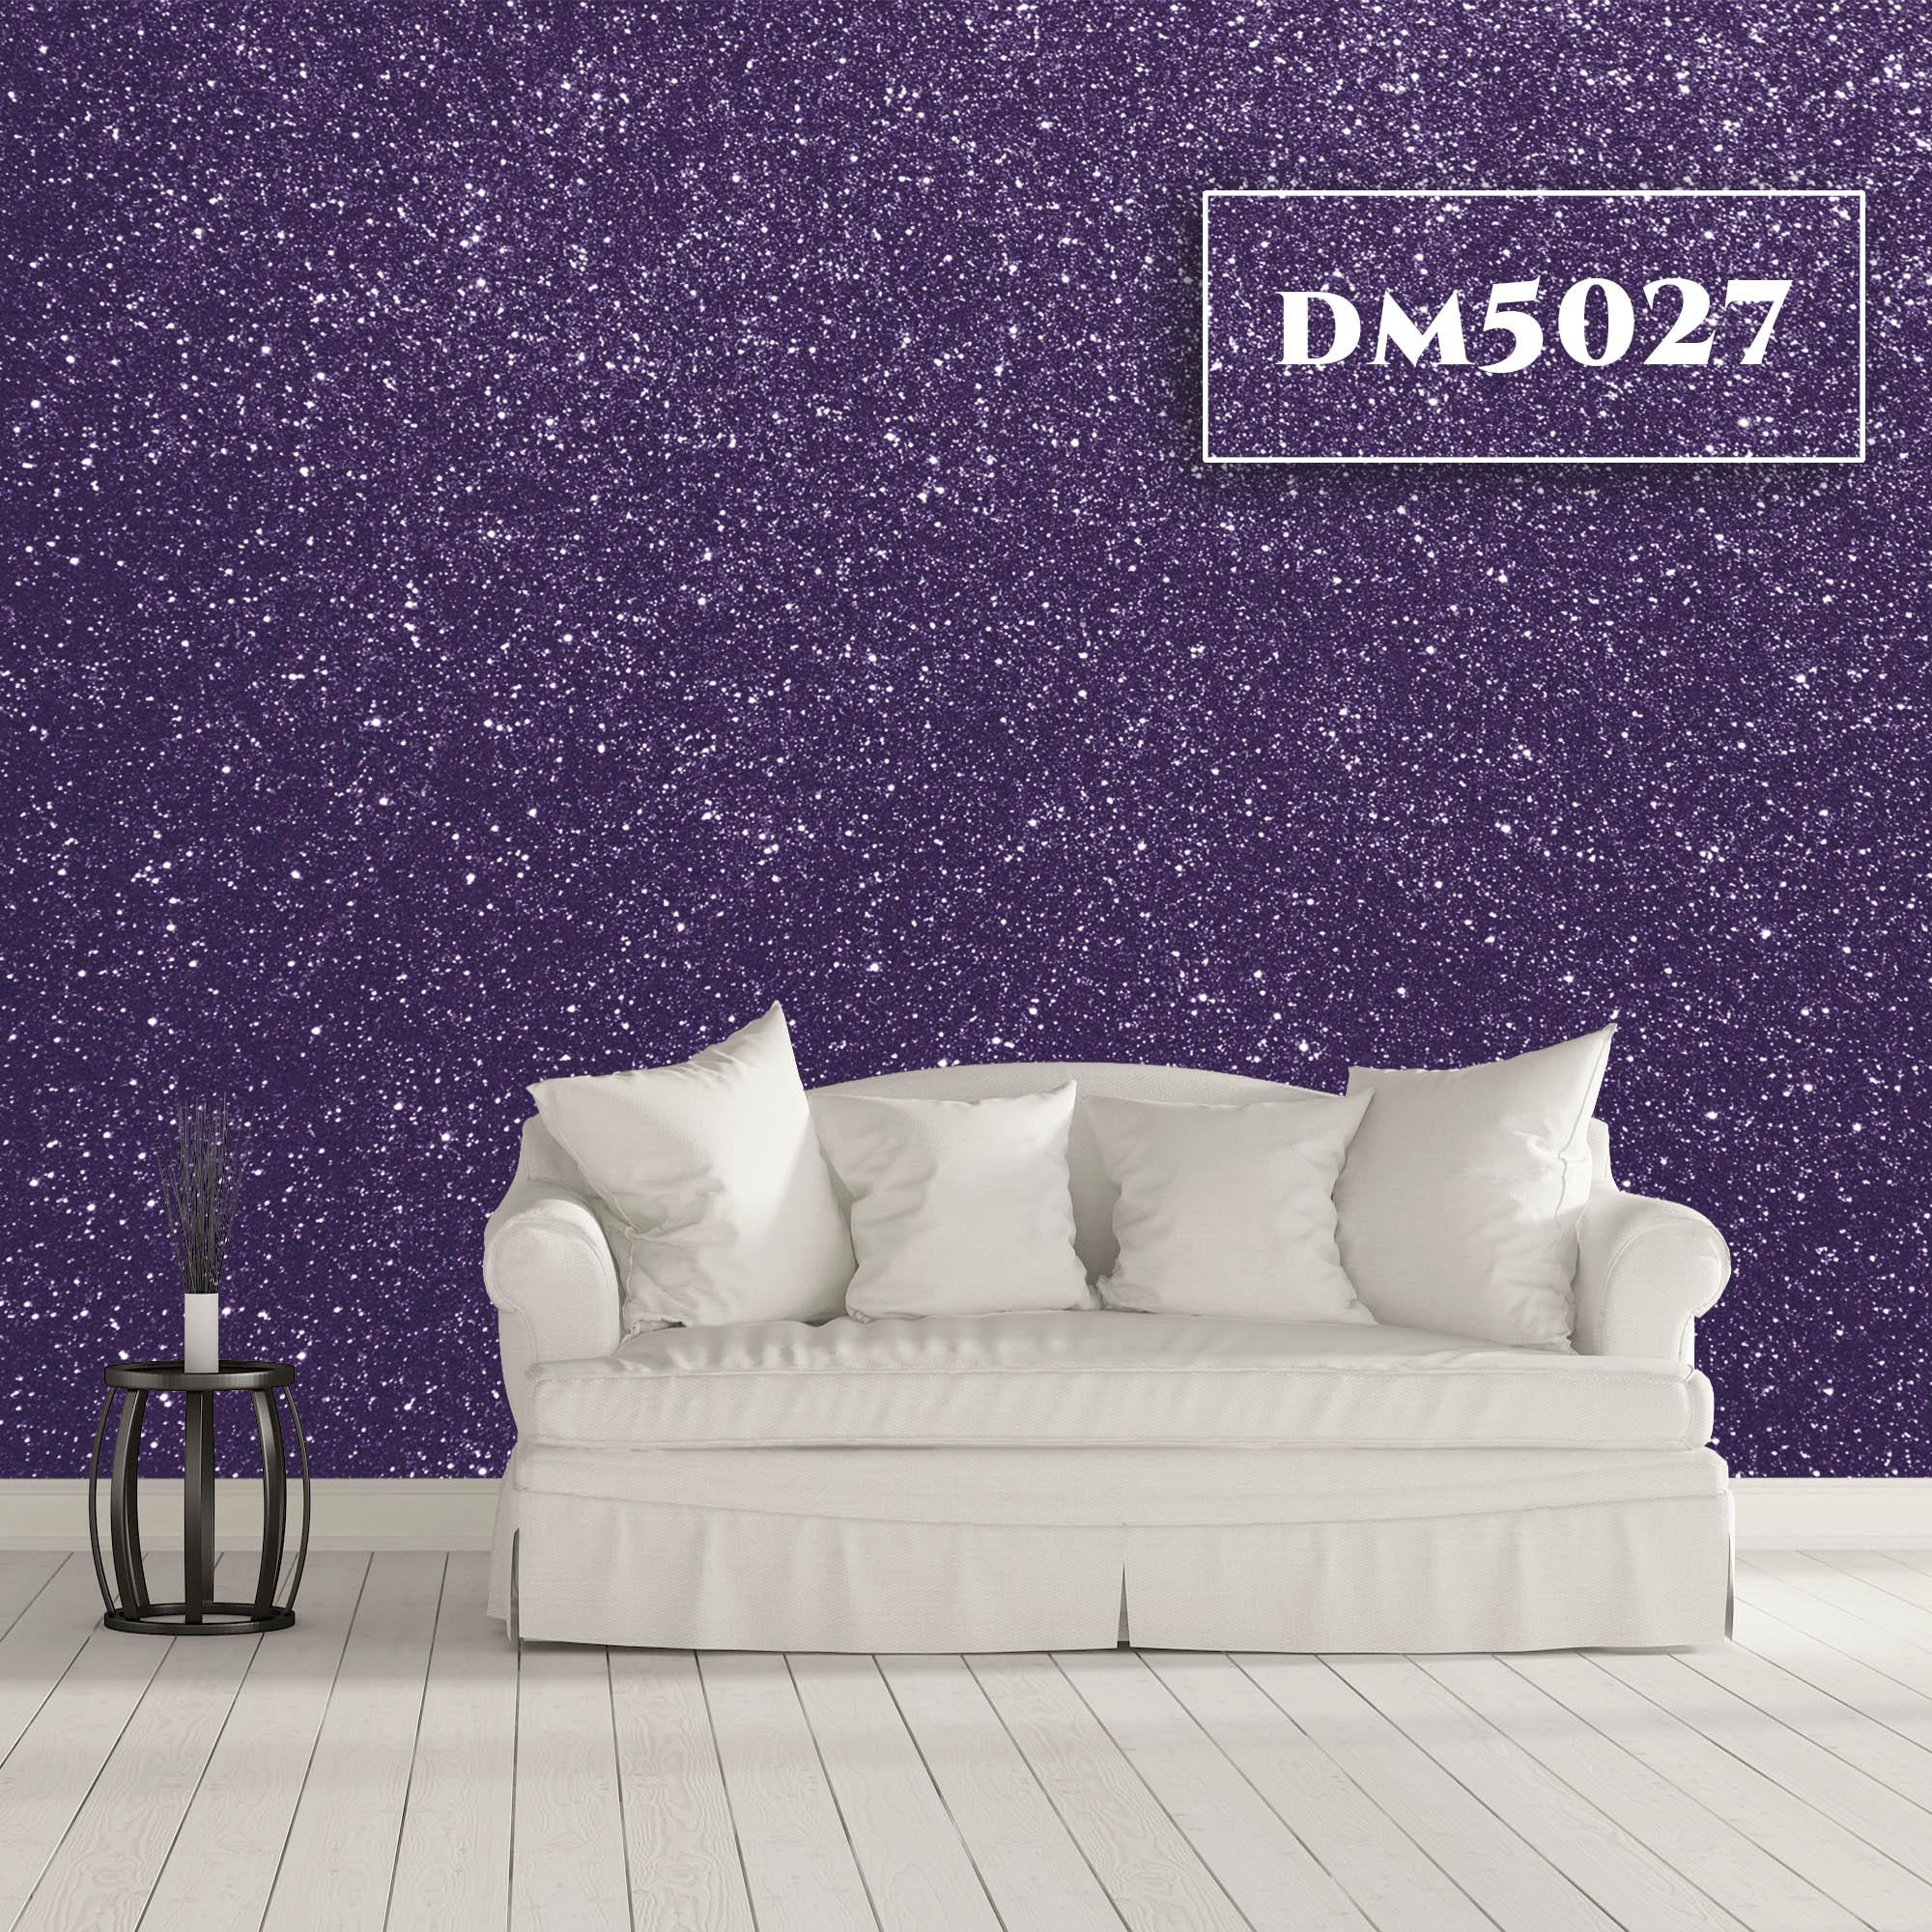 DM5027